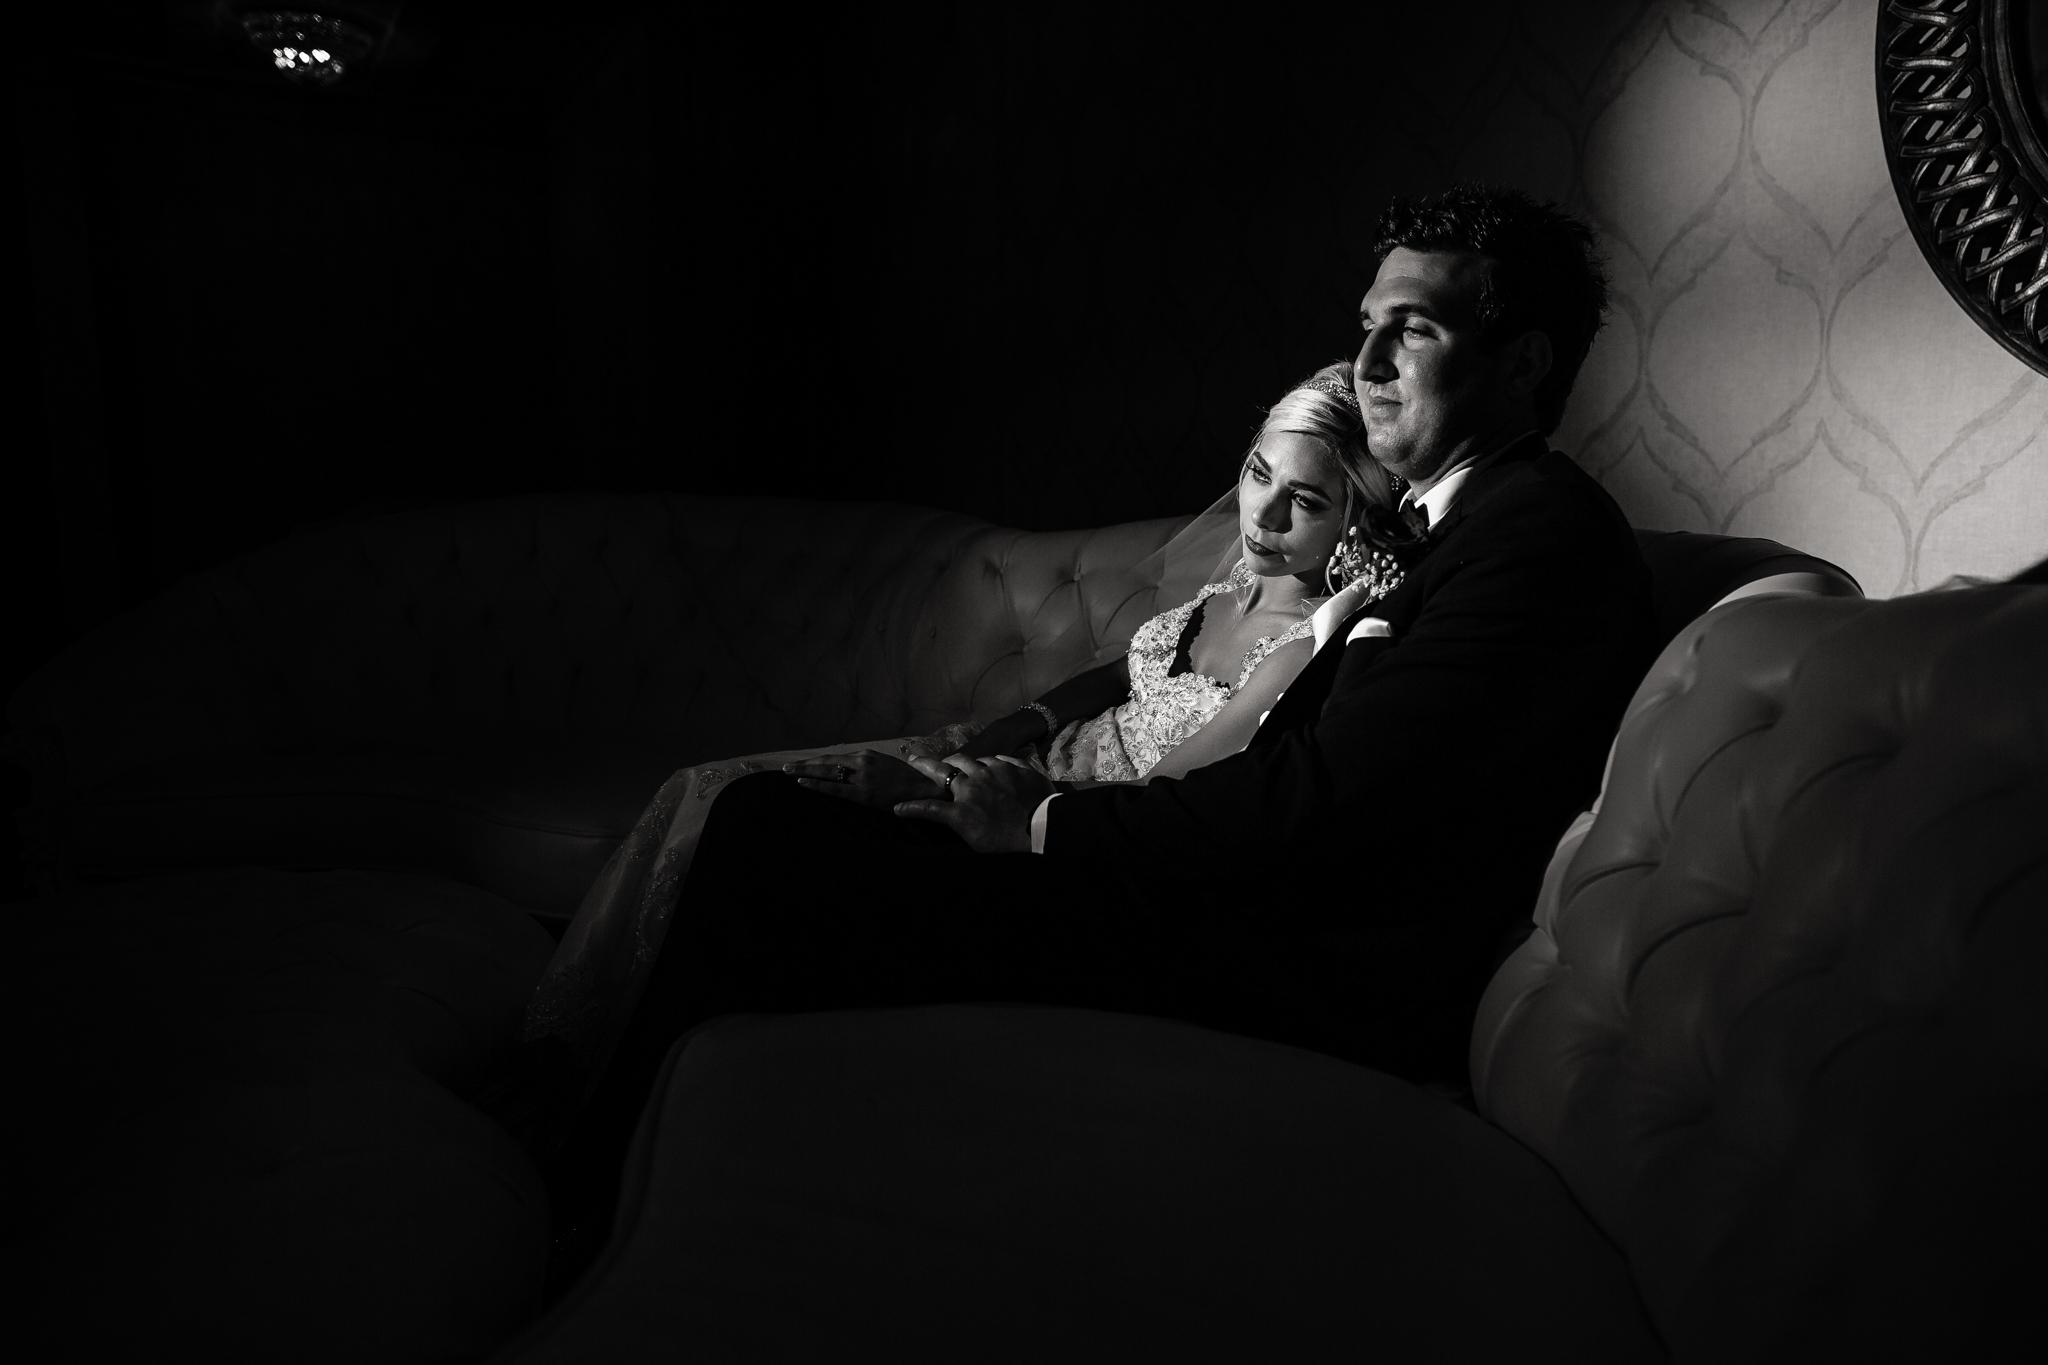 Statler-City-Buffalo-wedding-photographer- 0464bw.jpg